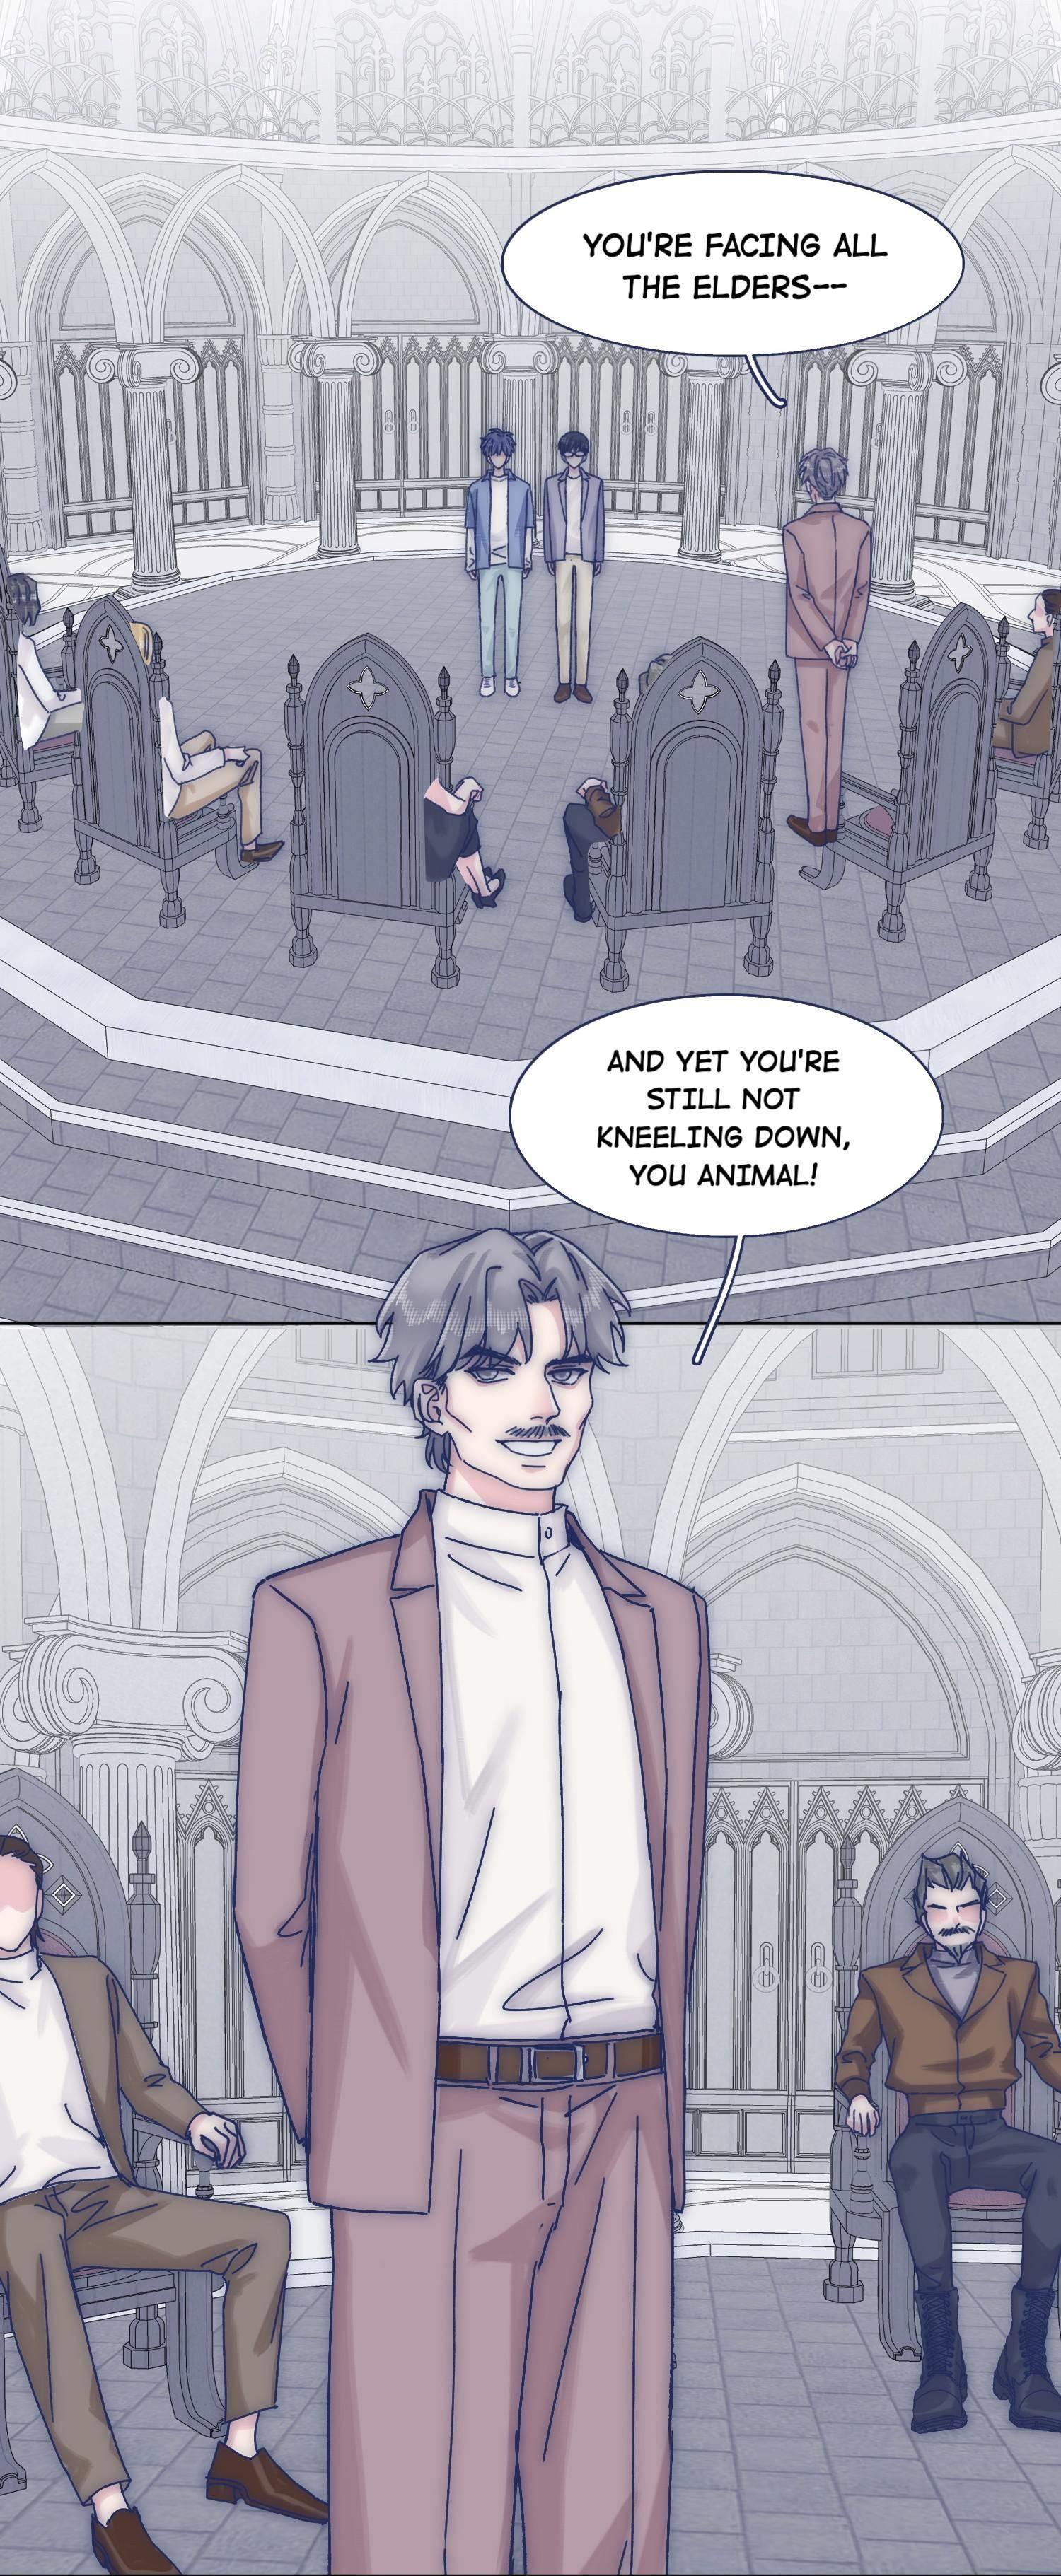 I Offer My Neck To You Chapter 68 page 10 - Mangakakalot